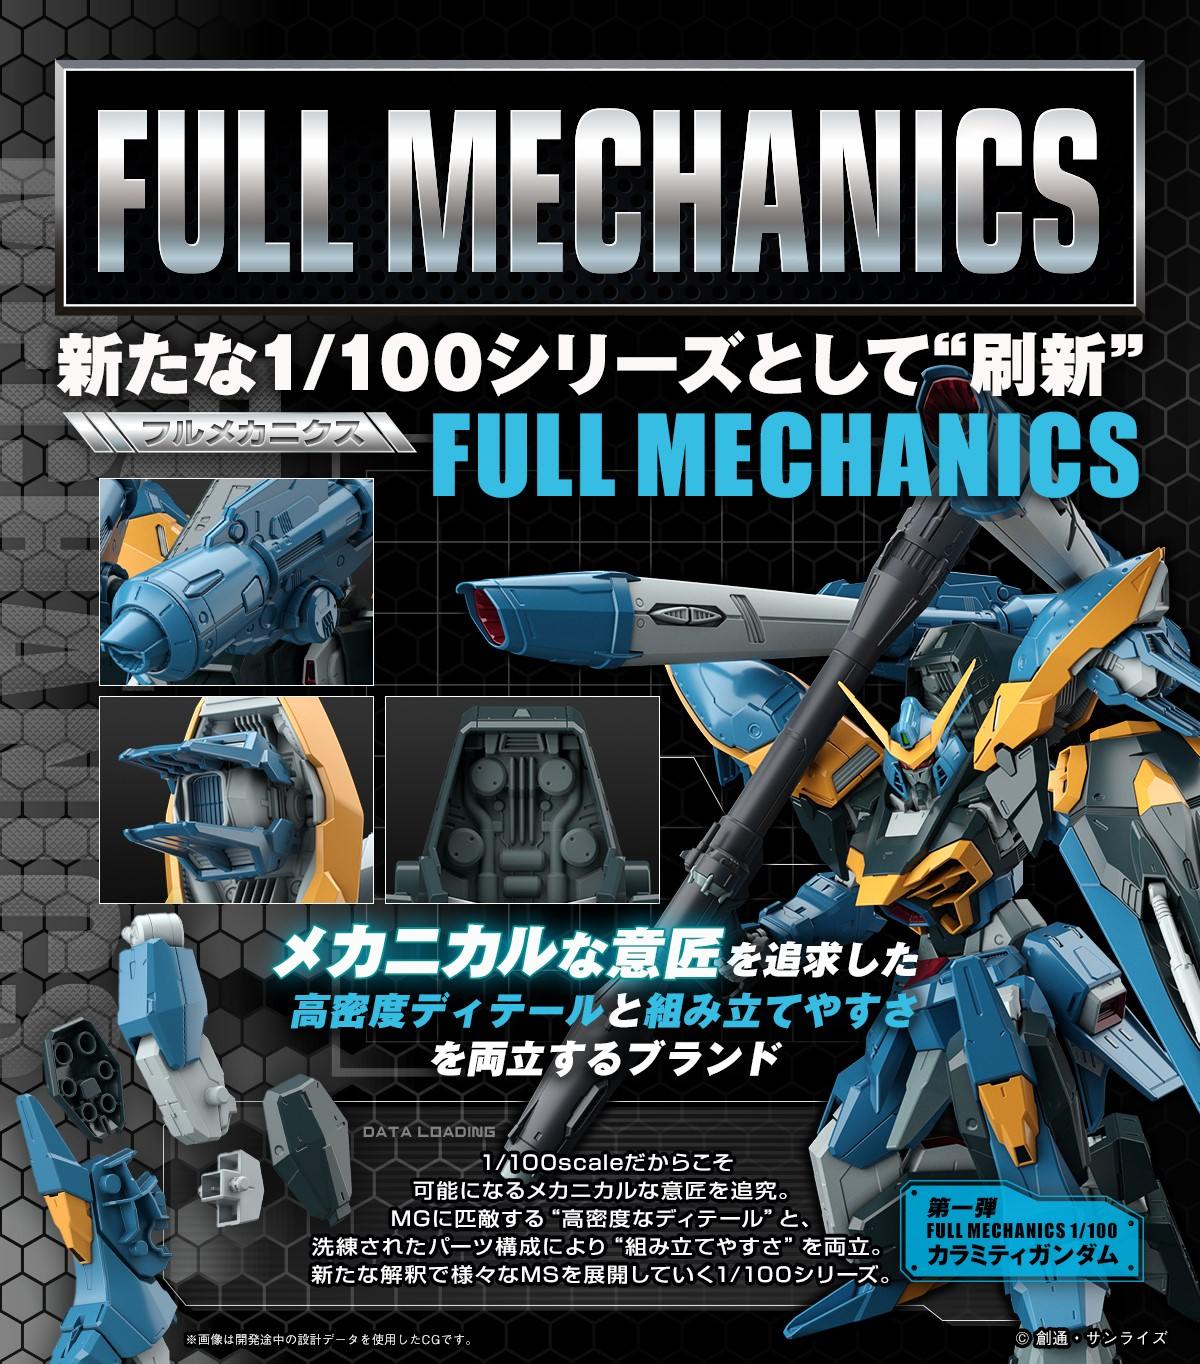 FULL MECHANICS 1/100 カラミティガンダム 5061662 4573102616623 公式商品説明(画像)